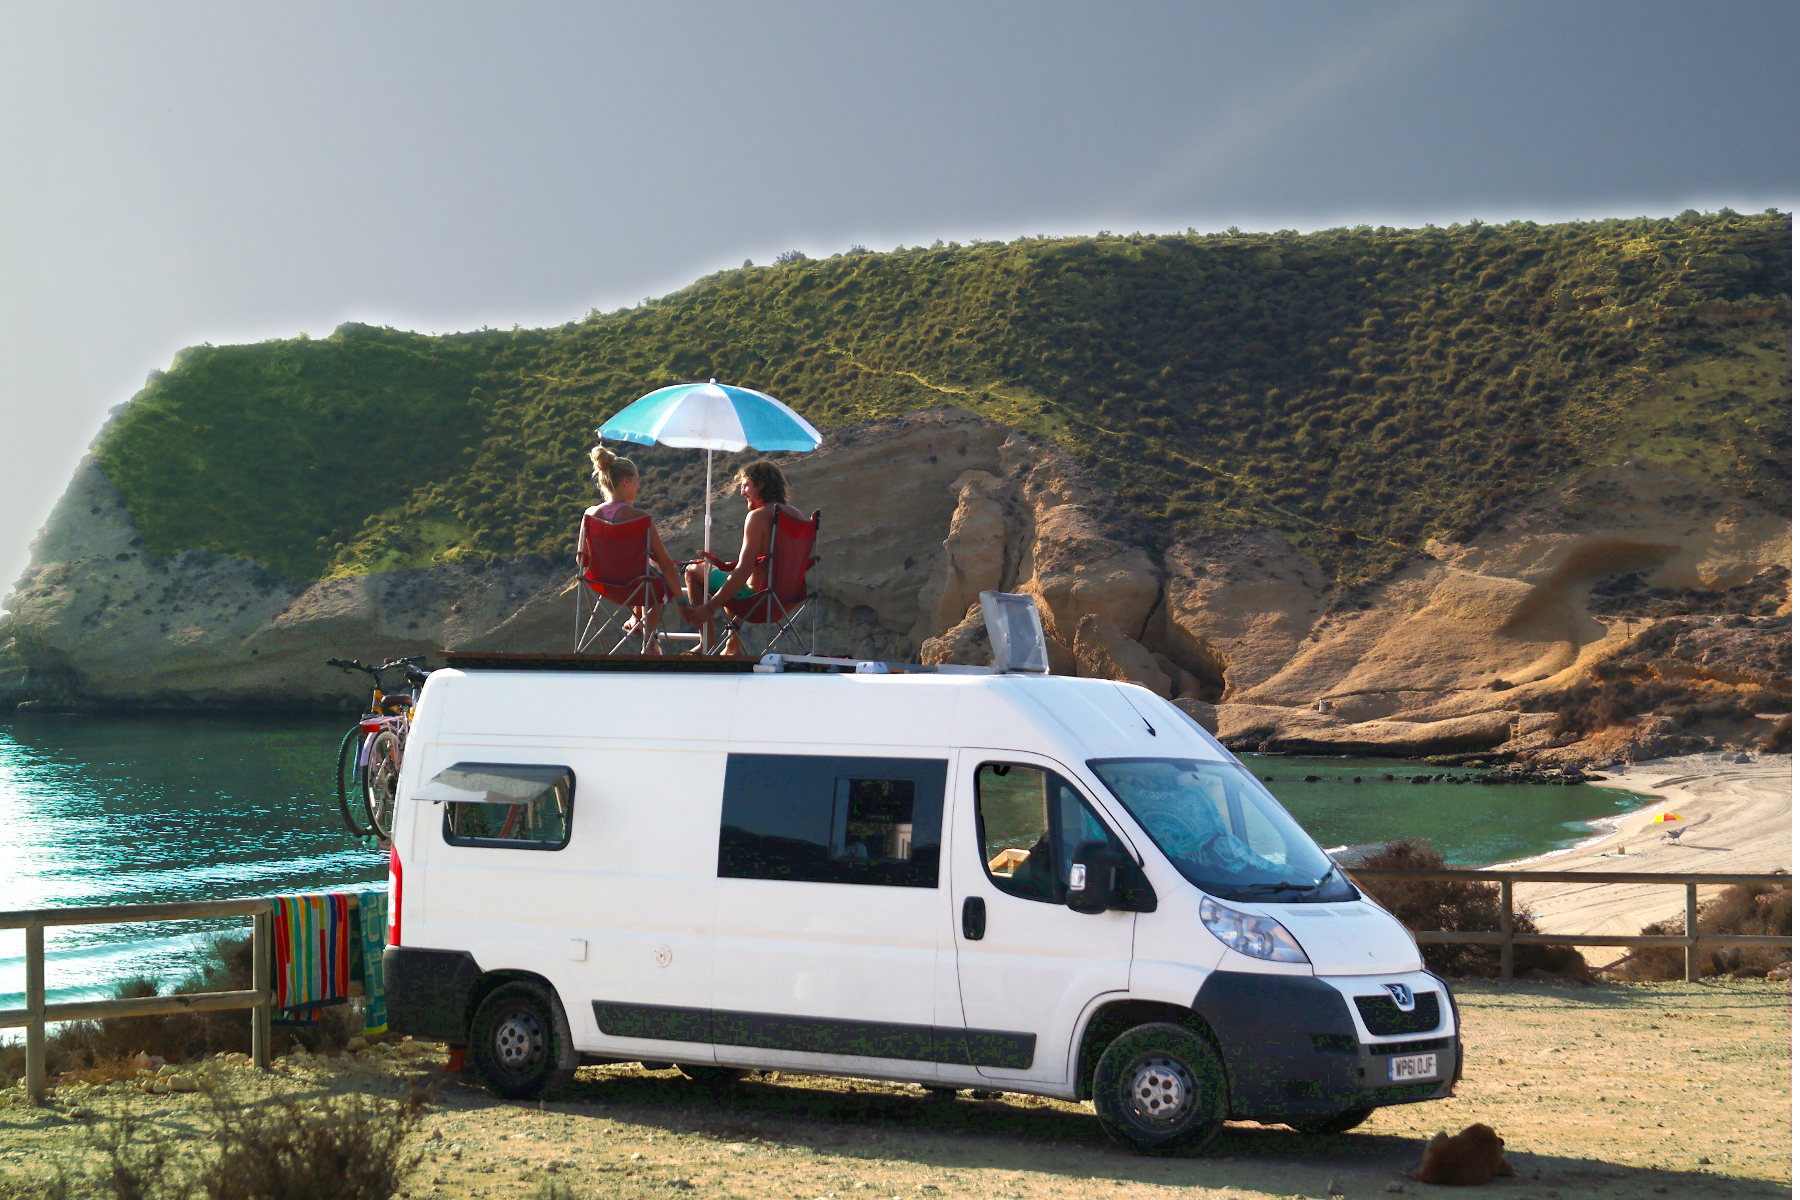 Campervan beach life